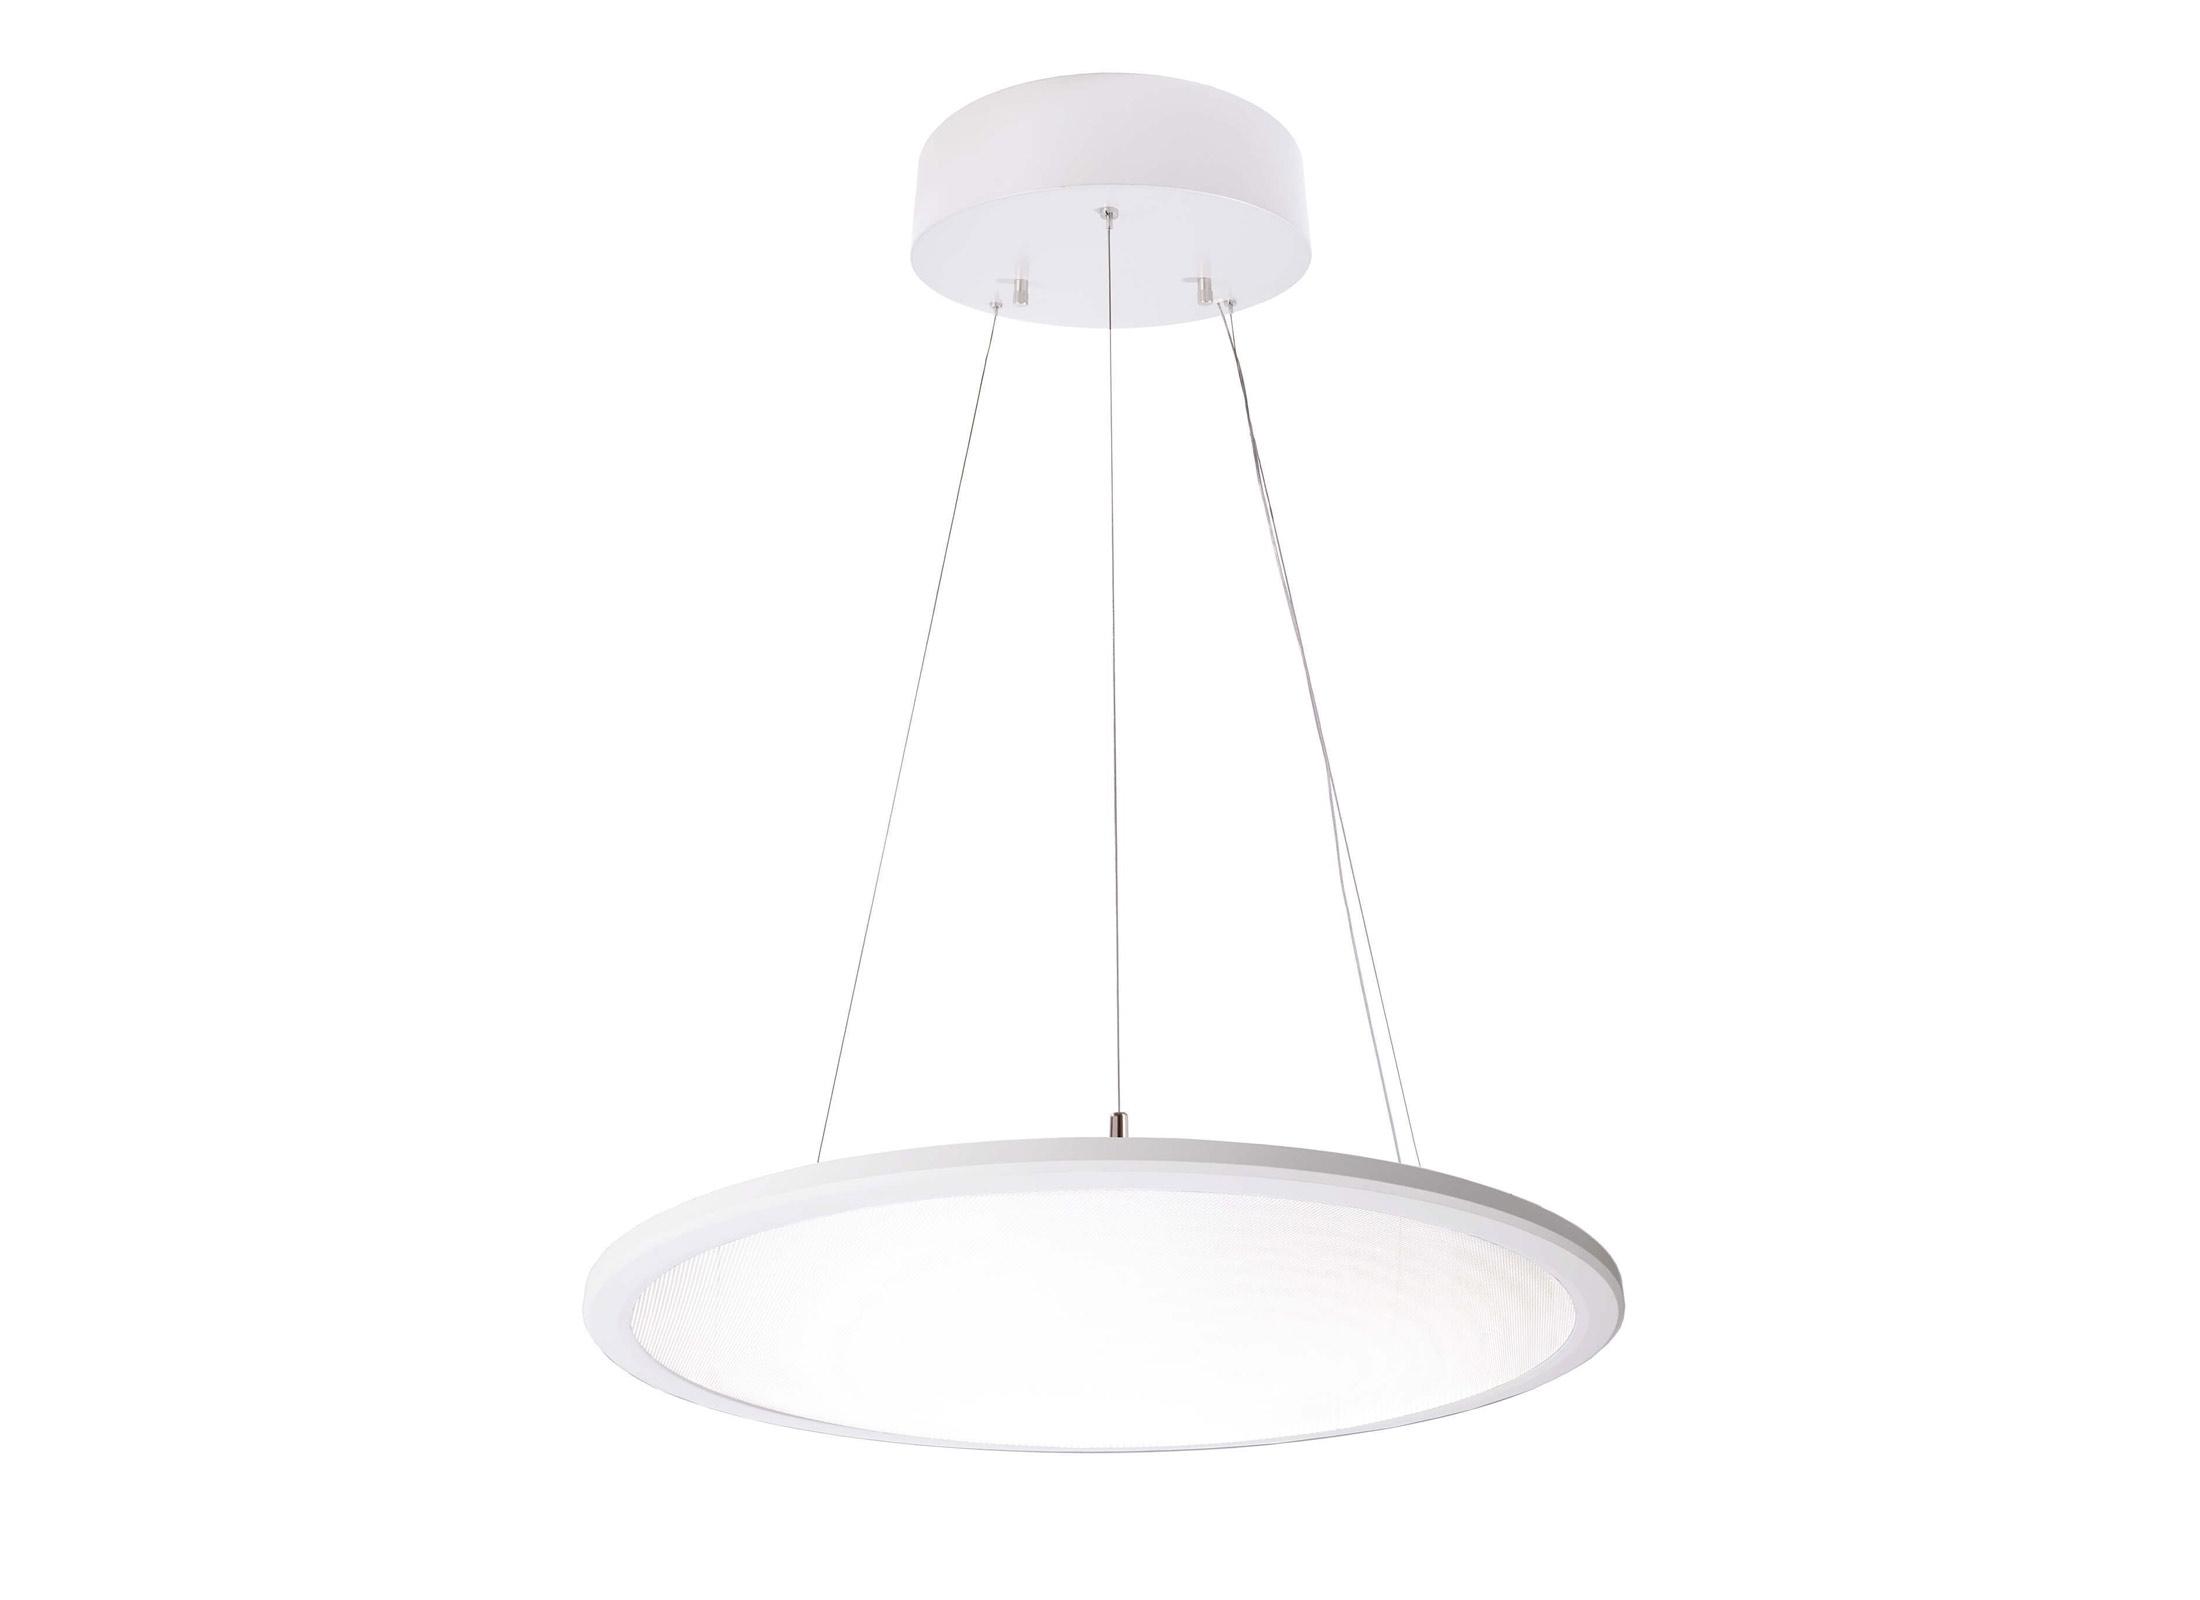 Deko Light LED Panel transparent rund LED Pendelleuchte, NW, 220K, 220x  20.20W LED, 1520°, 562020lm, inkl. Leuchtmittel